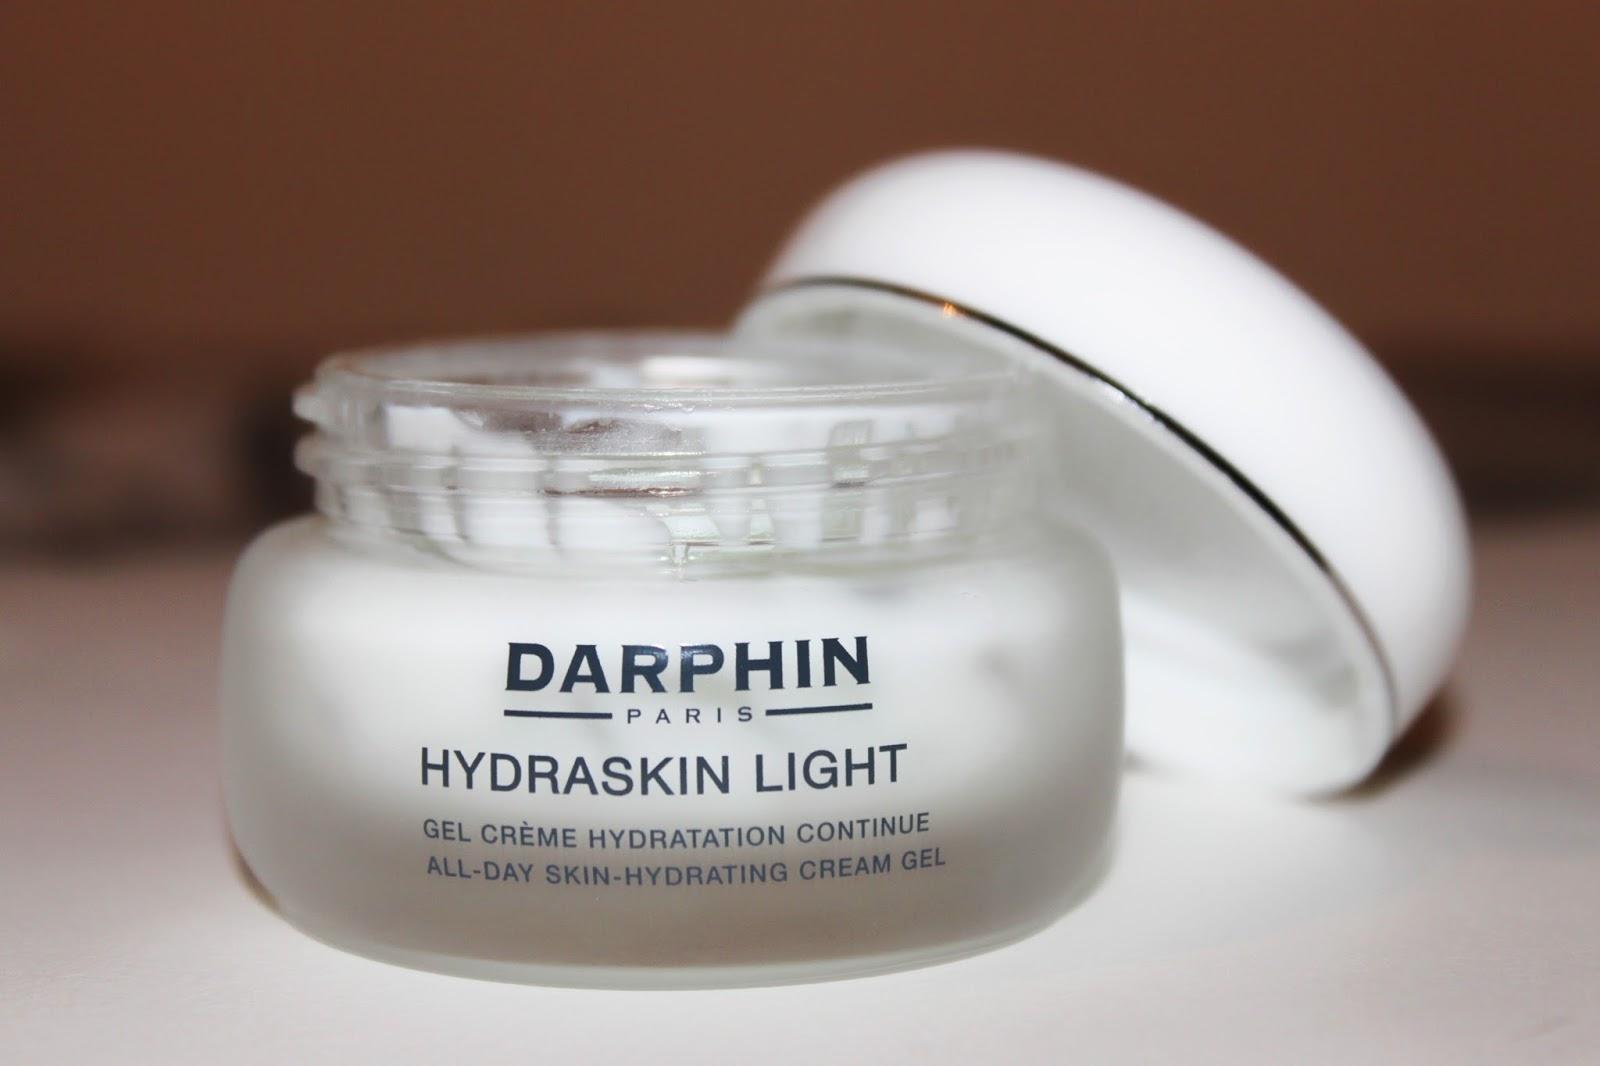 Hydraskin Light, Darphin - Produit terminé, Test revue, Mon avis @DEUXAIMES